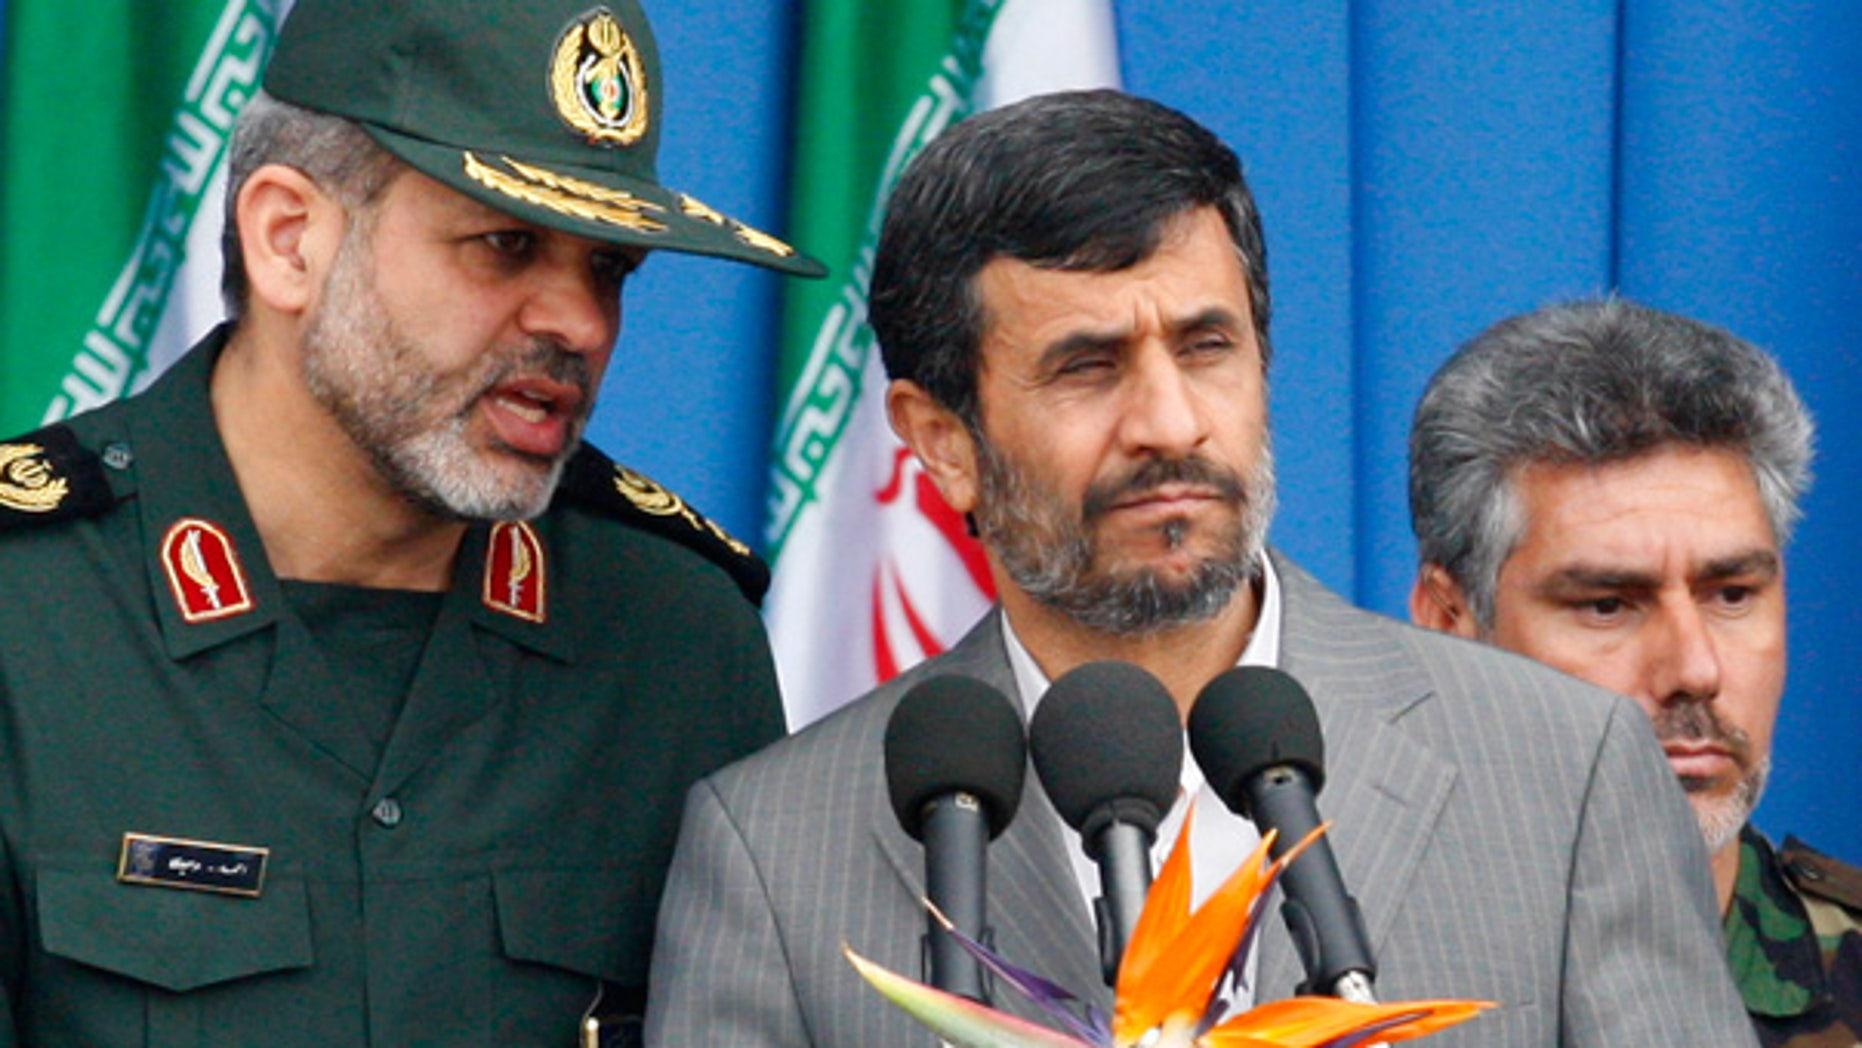 April 18: Iranian President Mahmoud Ahmadinejad listens to his Defense Minister, Gen. Ahmad Vahidi during an army parade in Tehran.